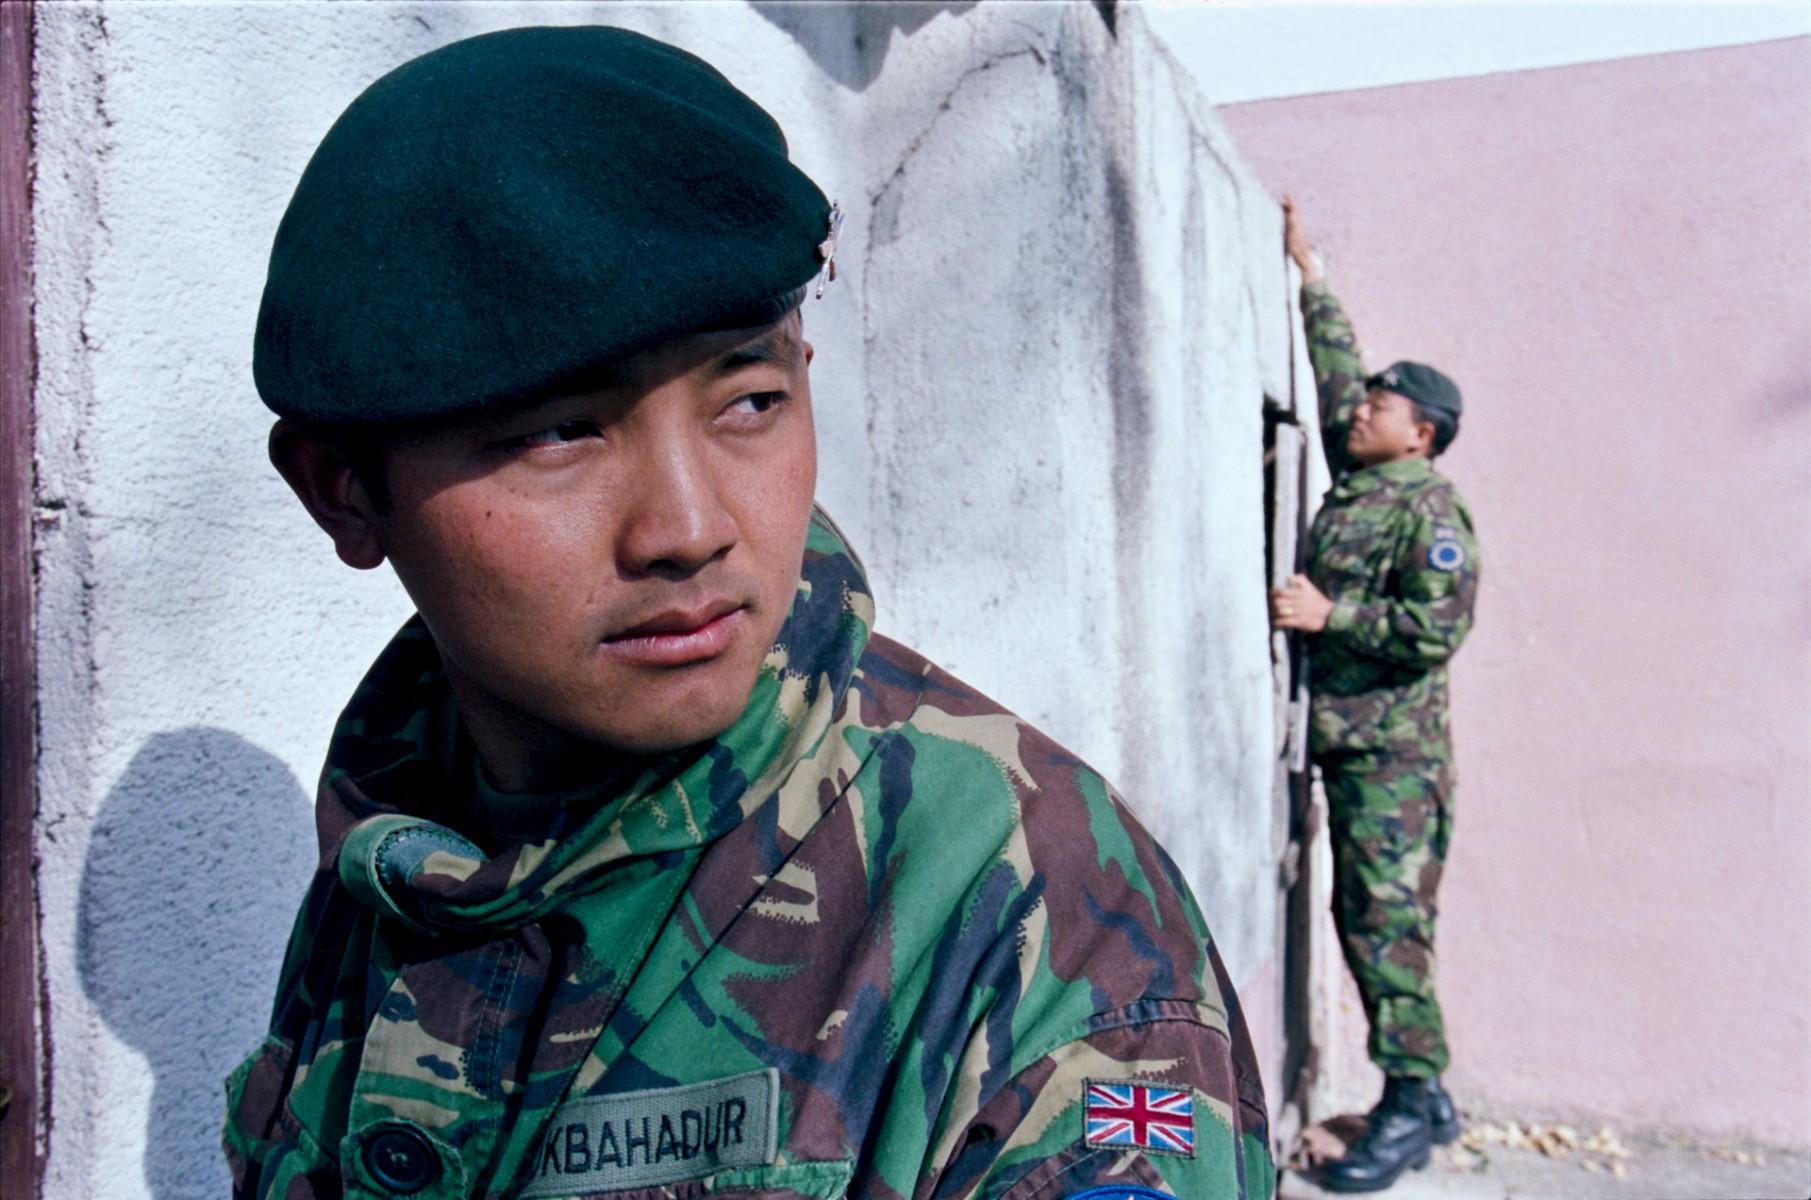 Gurkhas search a building, Bosnia